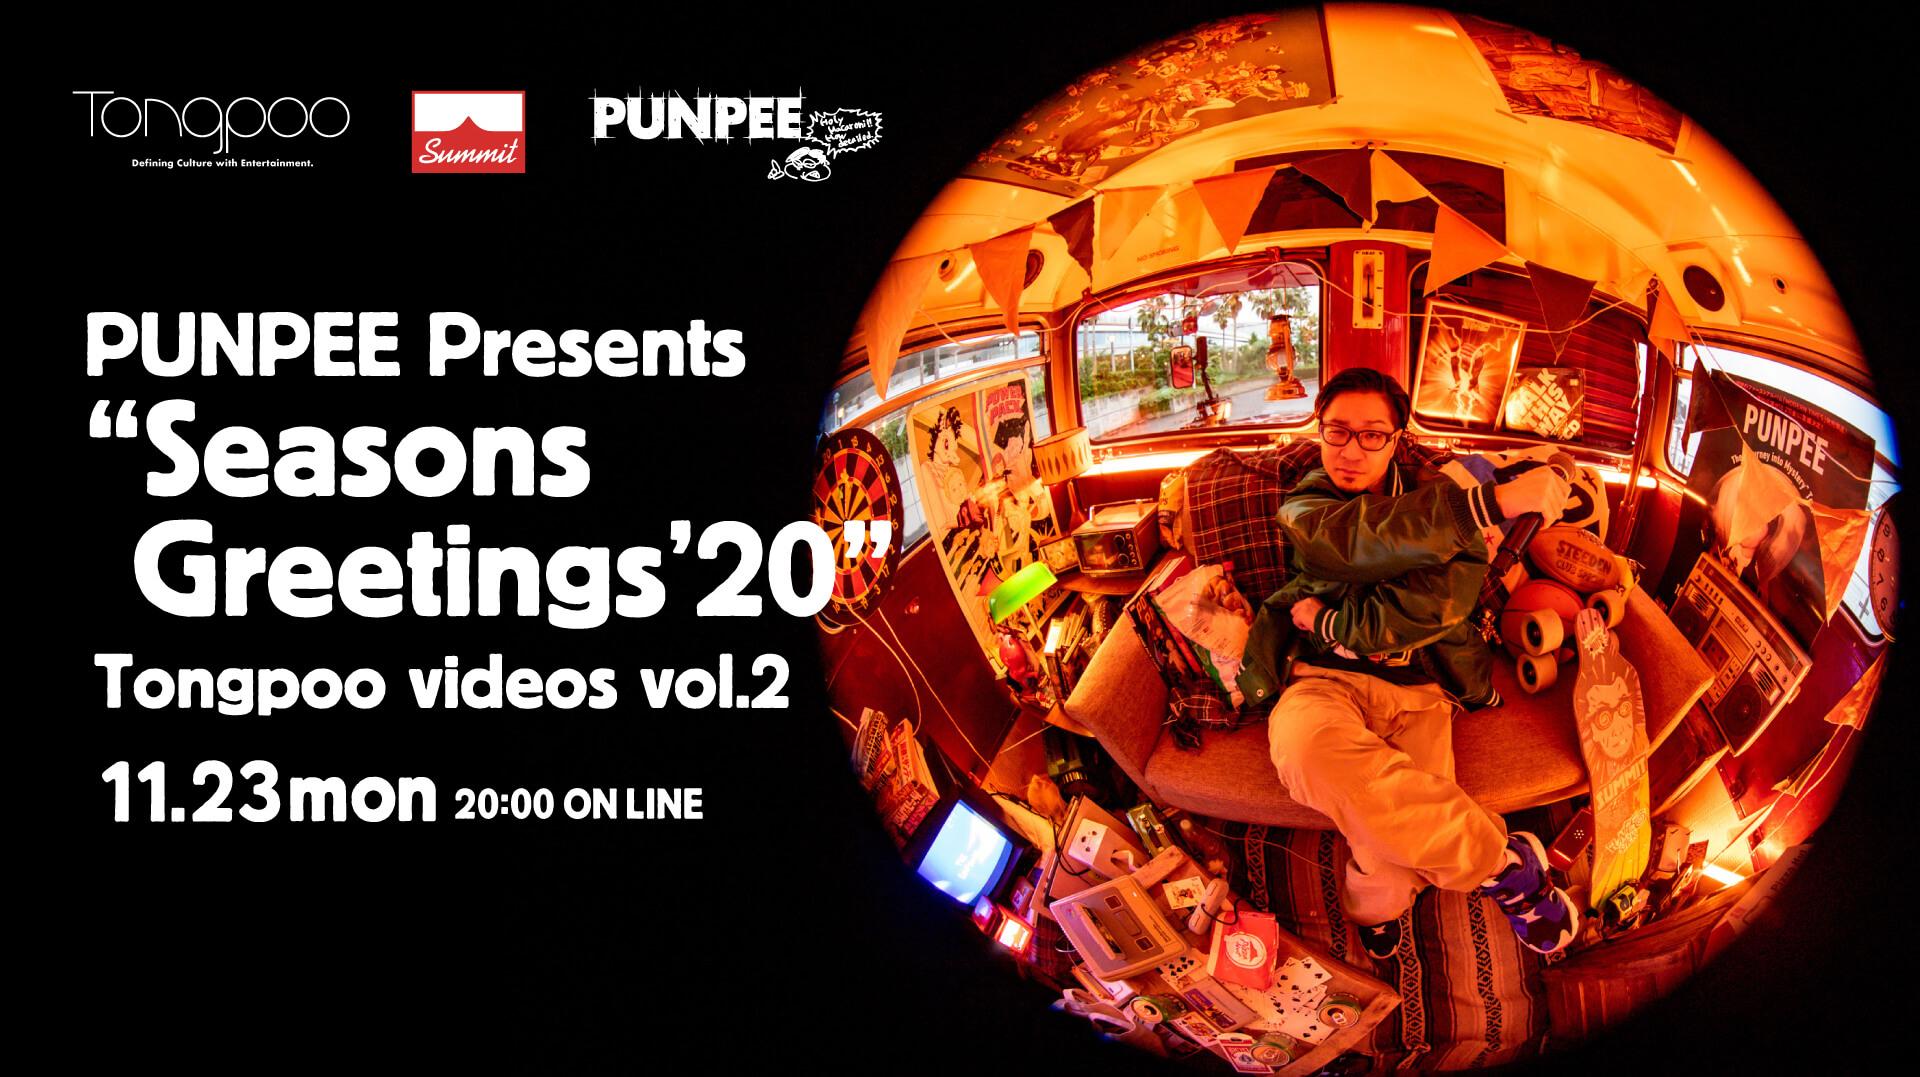 PUNPEE<Seasons Greetings'20>がTongpooにて独占配信決定!PUNPEEからコメントも「いつものメンツと慰安旅行的な感じです」 music201109_punpee_live_2